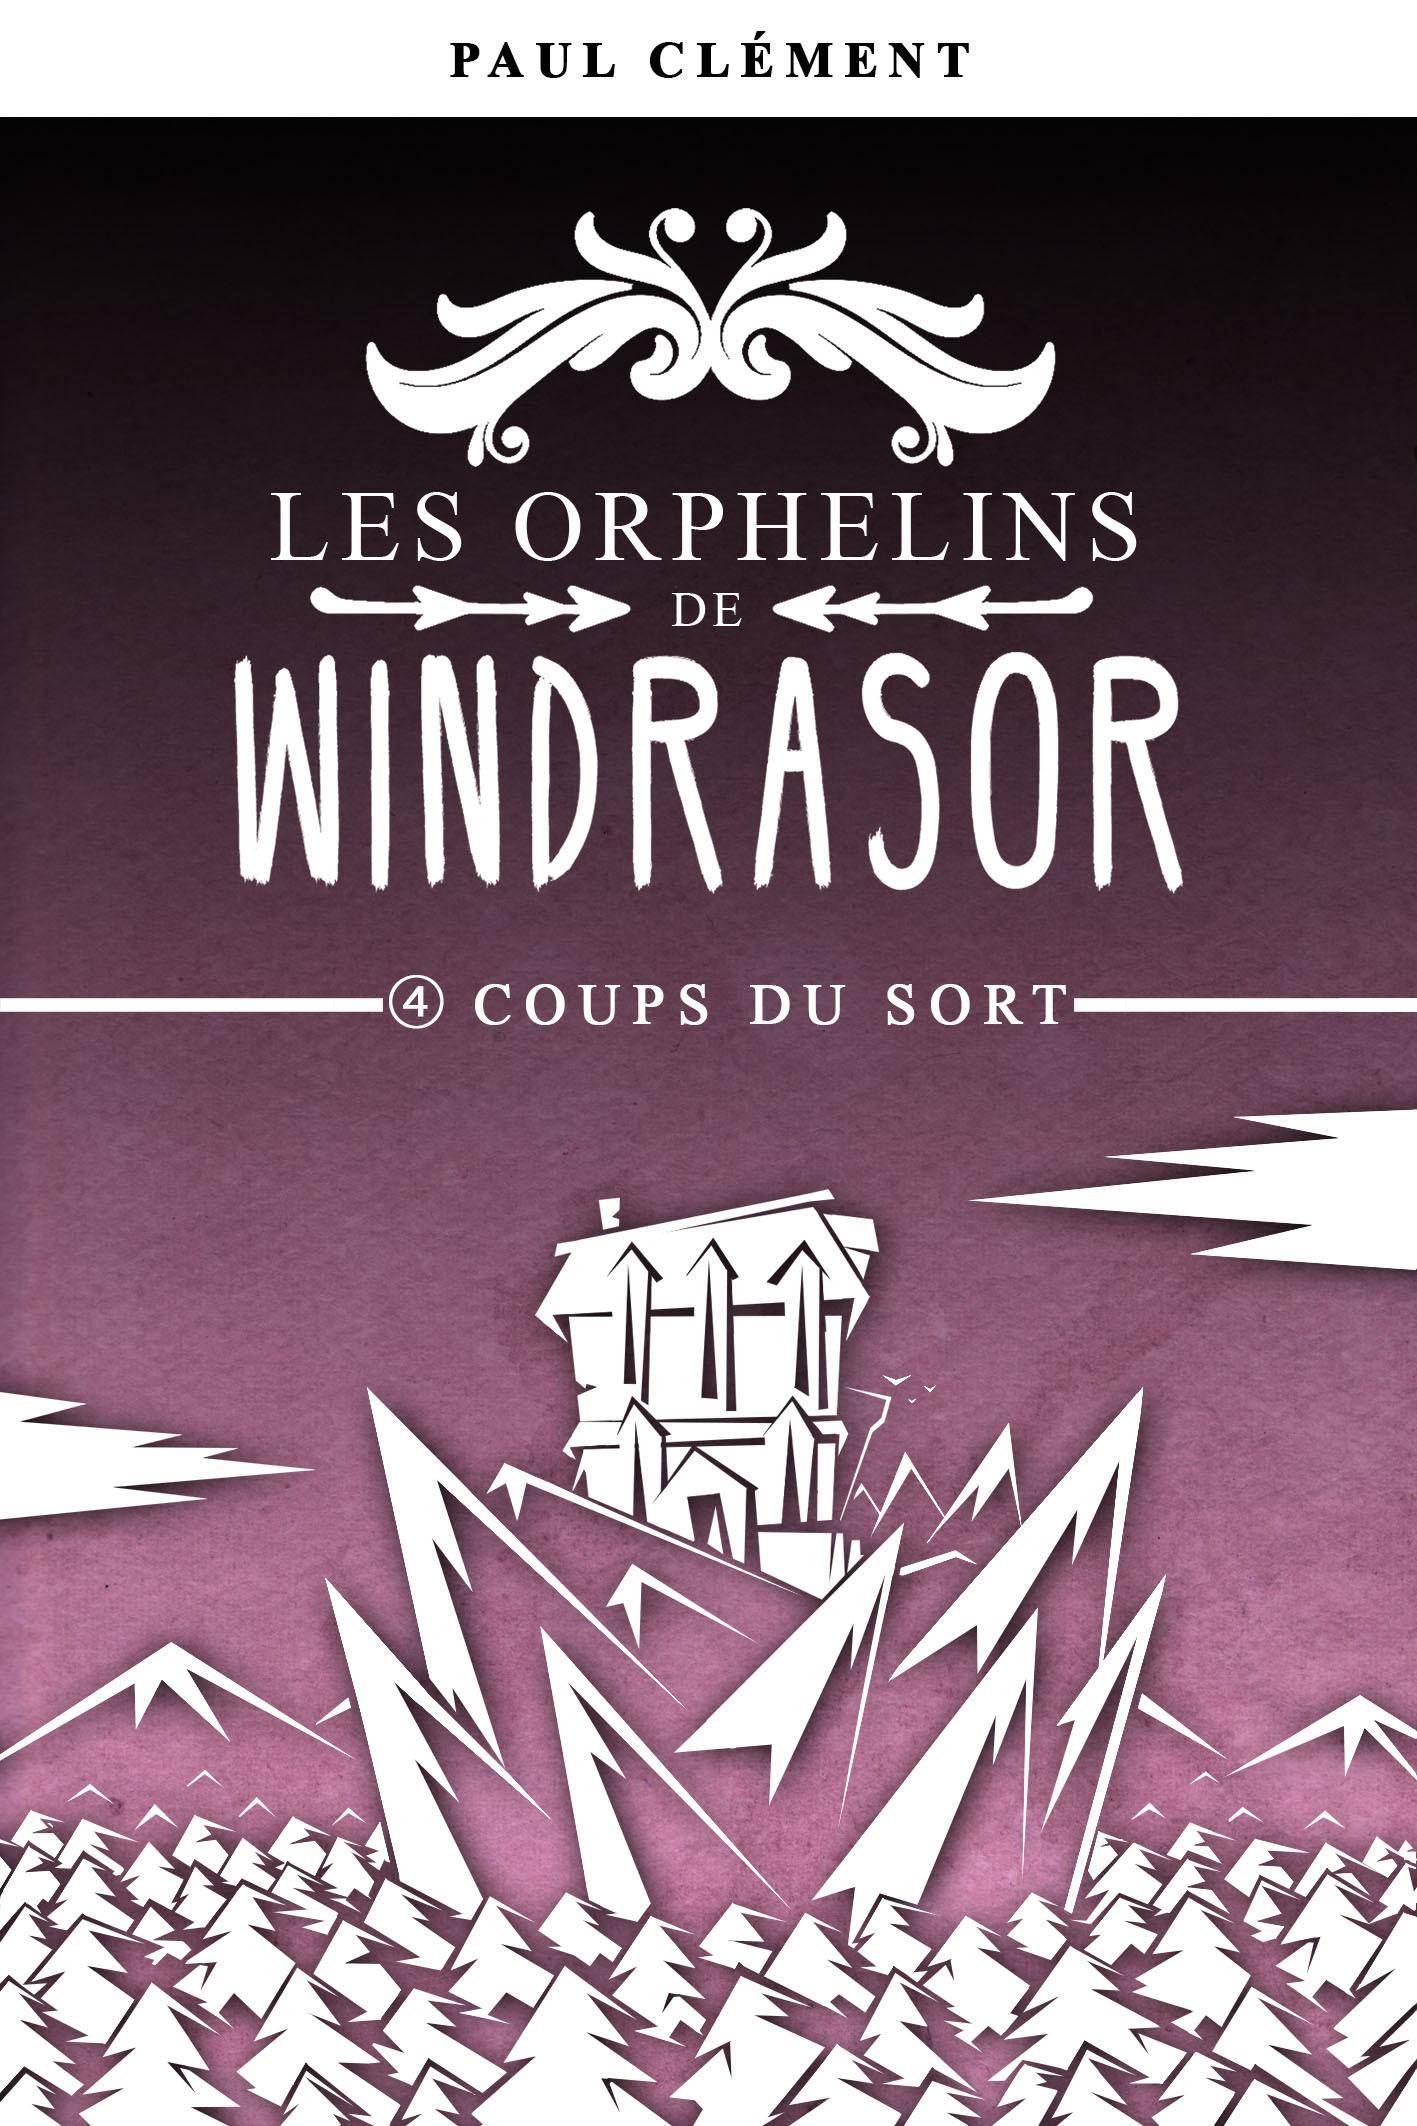 COUPS DU SORT (LES ORPHELINS DE WINDRASOR EPISODE 4)